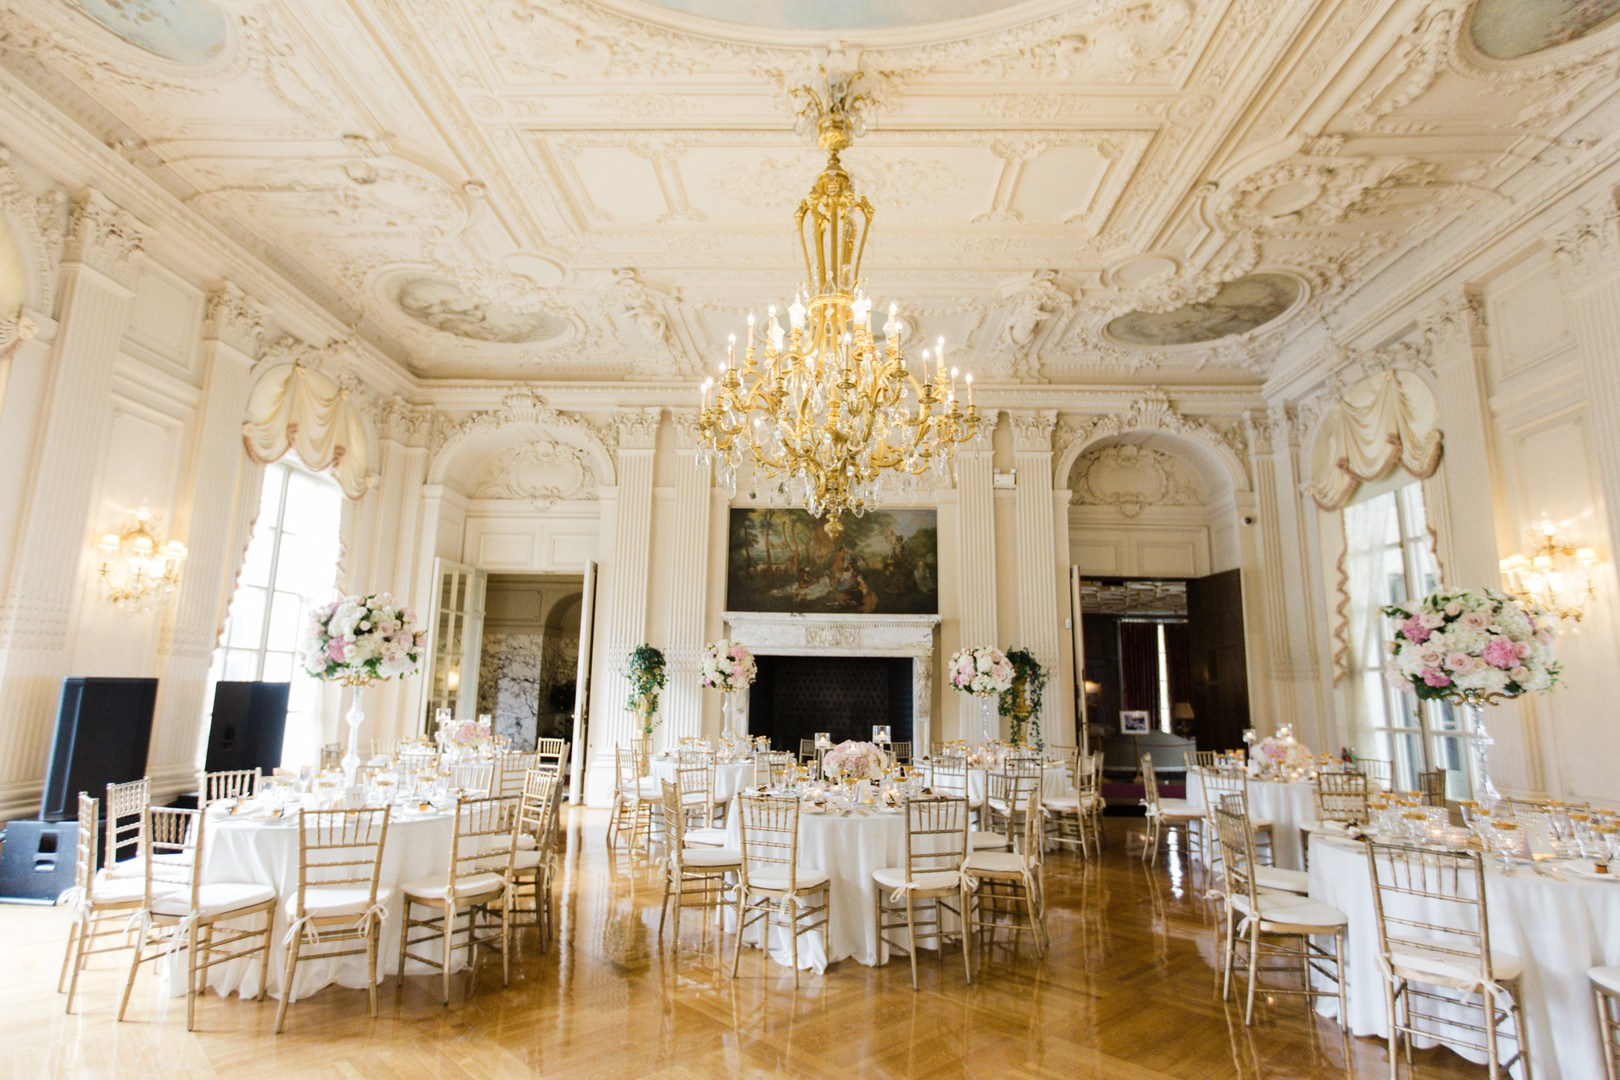 Rosecliff Wedding Venue Rhode Island – Cly by Matthew 3